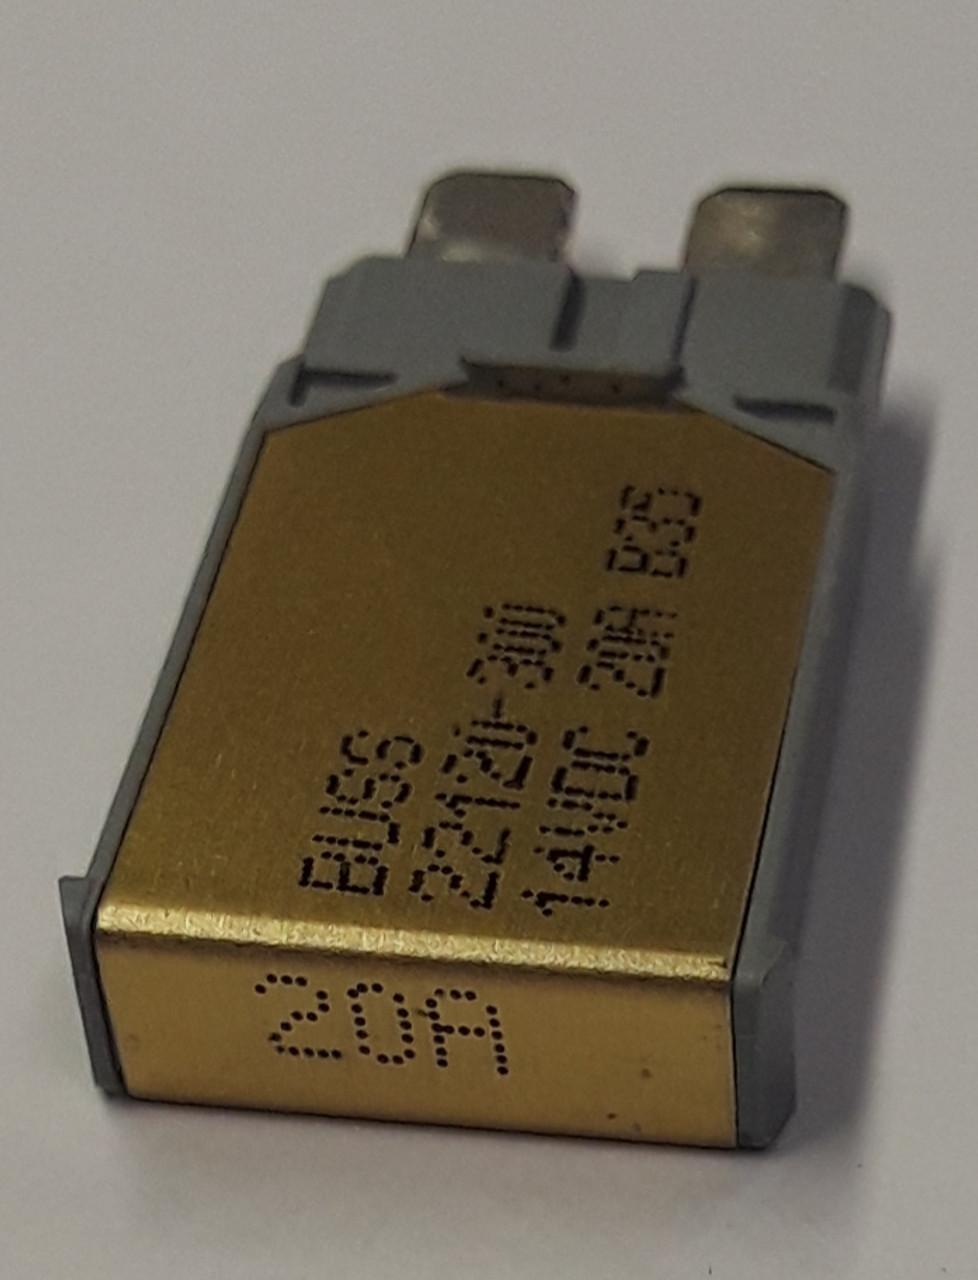 22120 300 cooper bussmann type 1 mini circuit breaker auto reset 20 amps [ 978 x 1280 Pixel ]